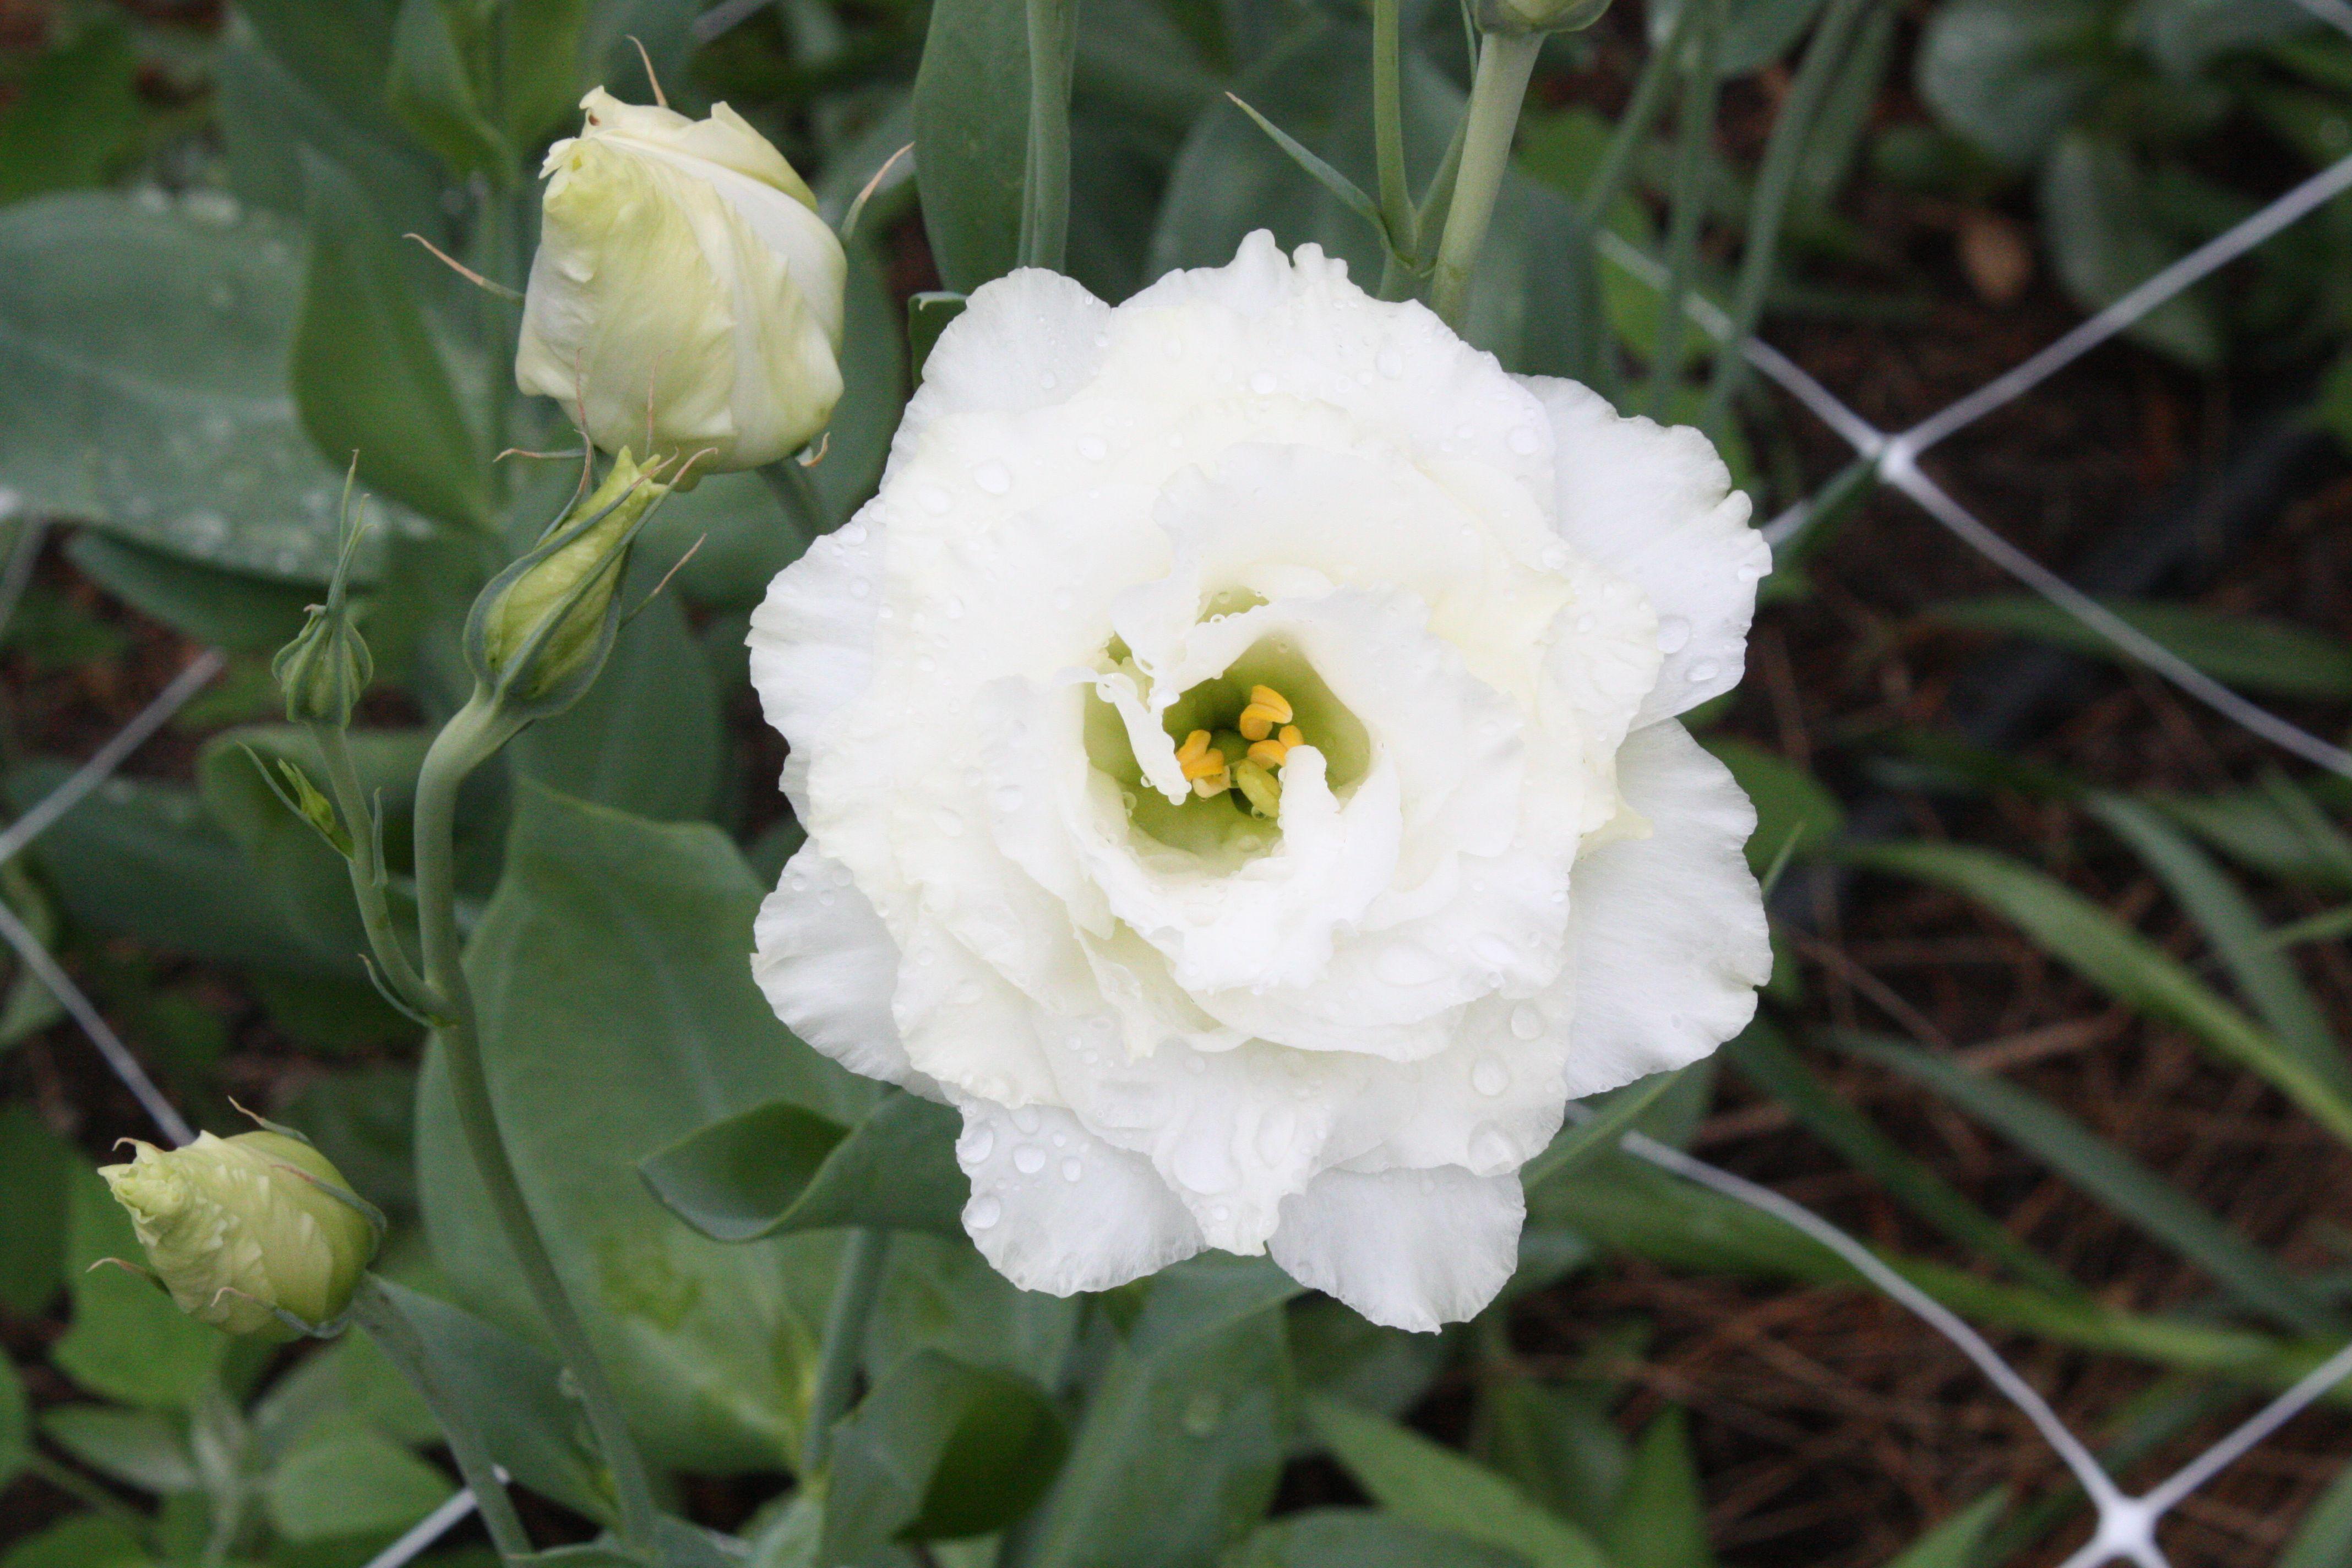 White Lisianthus The Modern Rose July Seasonal Flowers Massachusetts Romantic July Flowers Seasonal Flowers Flower Farm